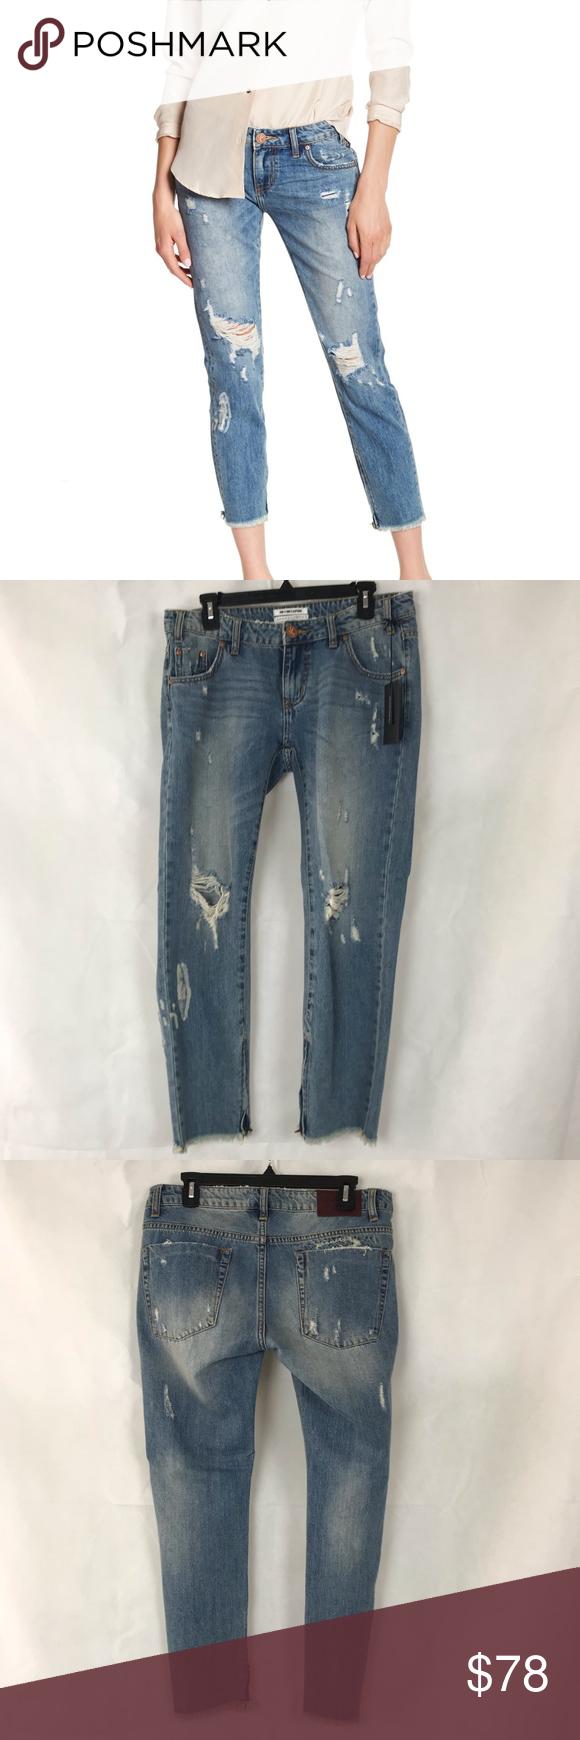 One Teaspoon Freebirds Blue Buoy Jeans Size 29 Clothes Design Jeans Size Fashion Design